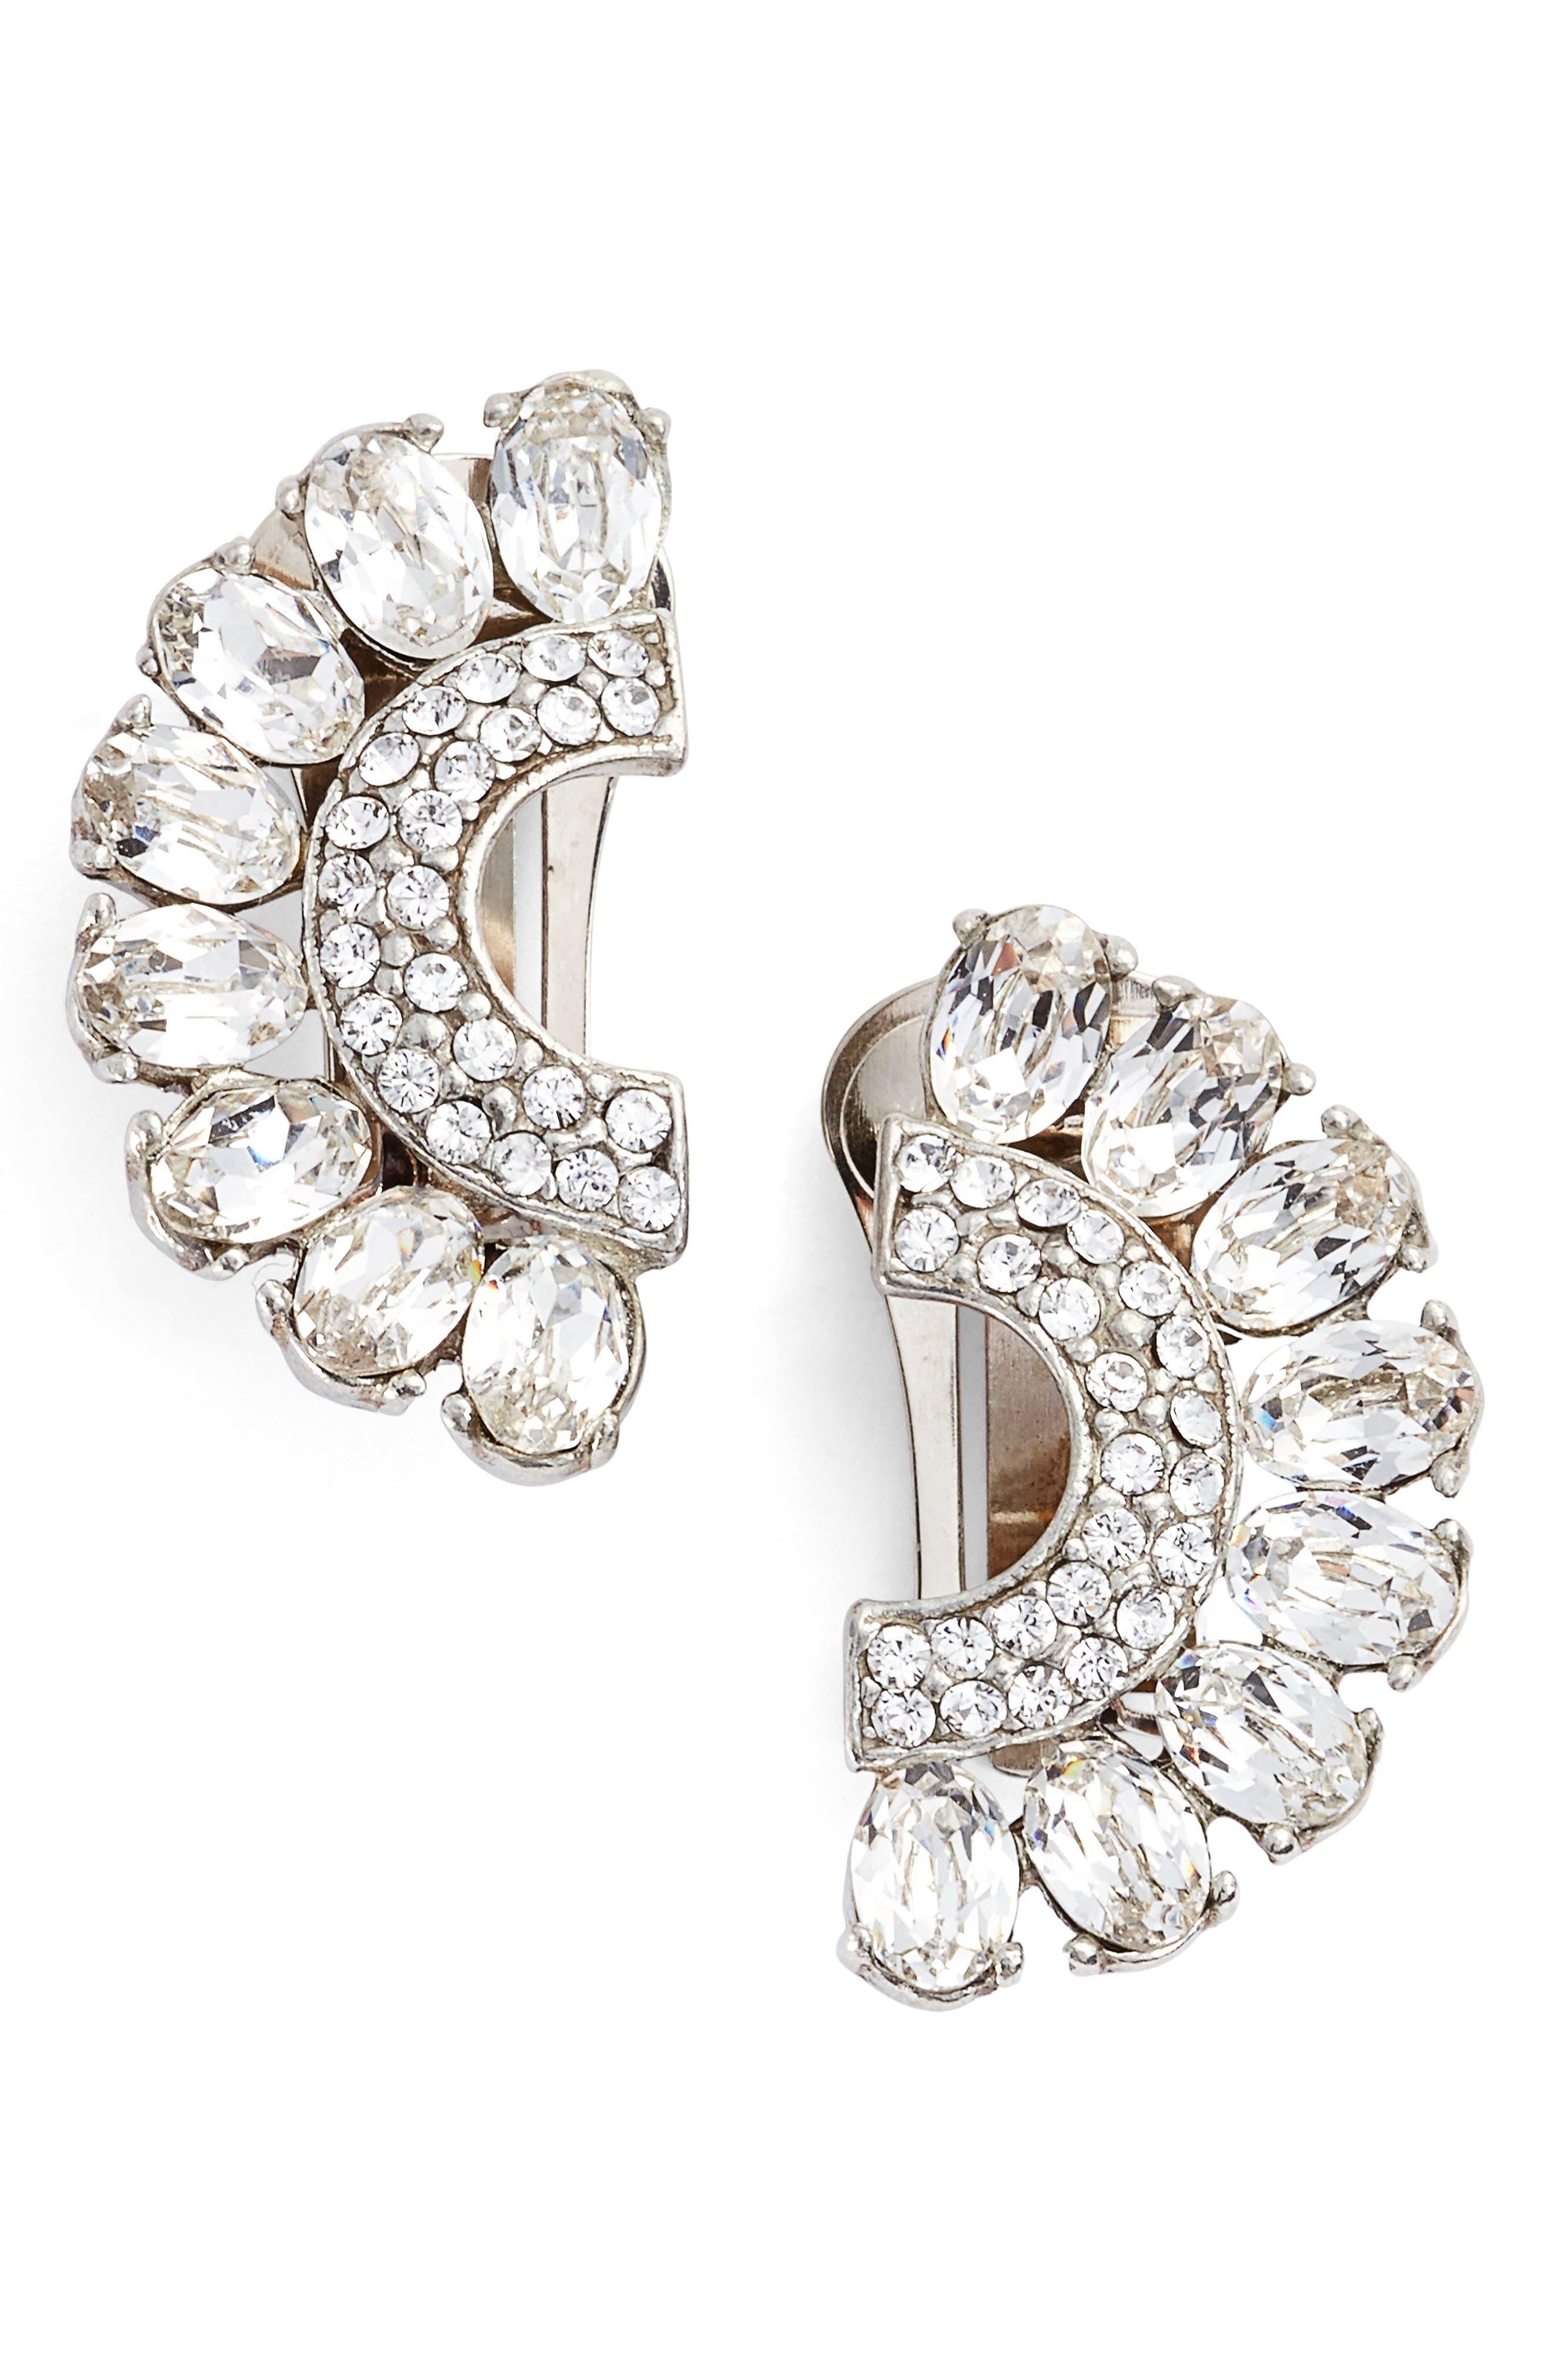 Main Image - Ben-Amun Half Moon Clip Earrings